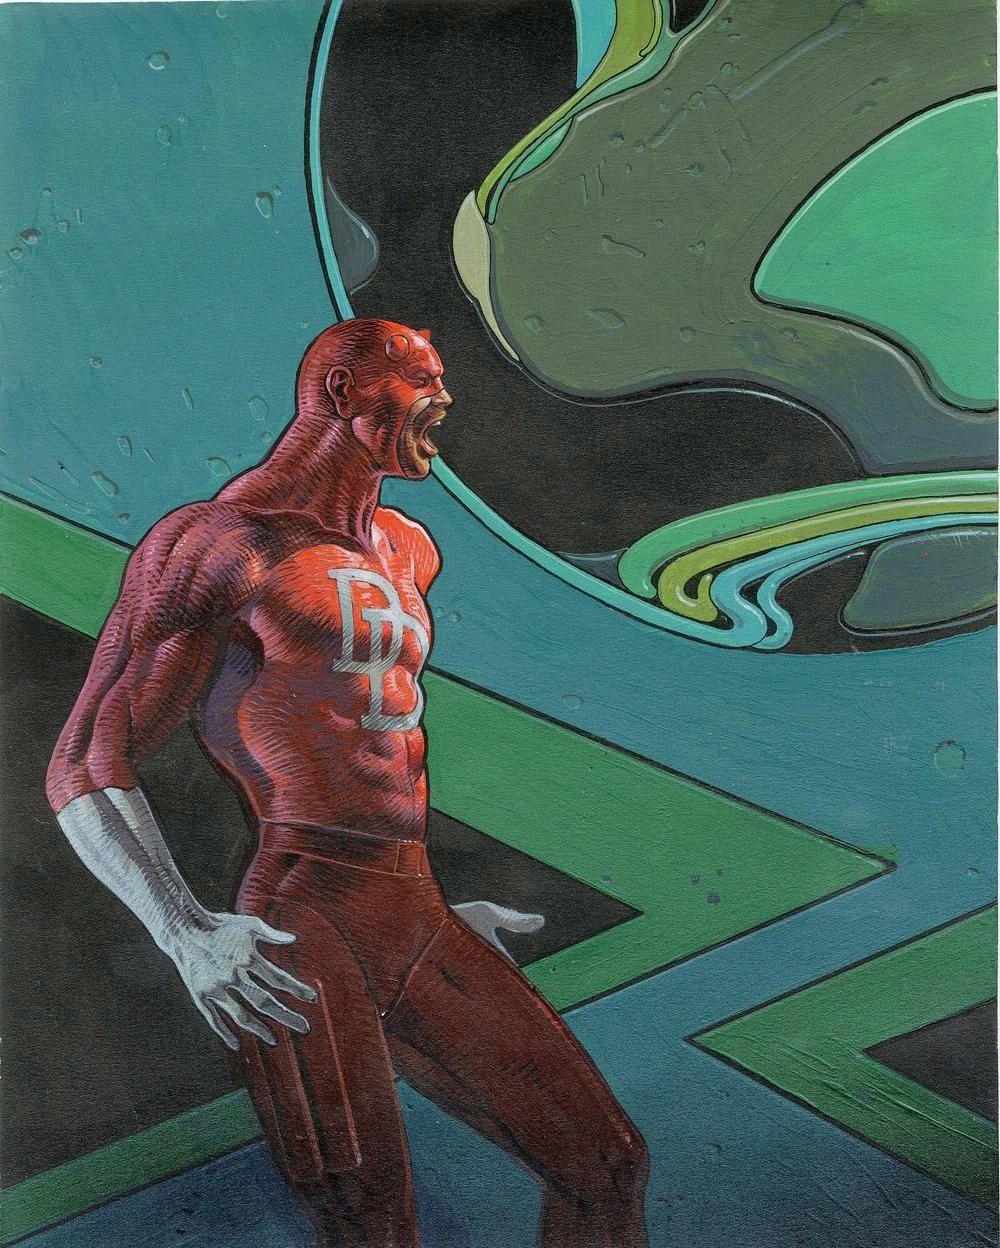 Daredevil by Moebius